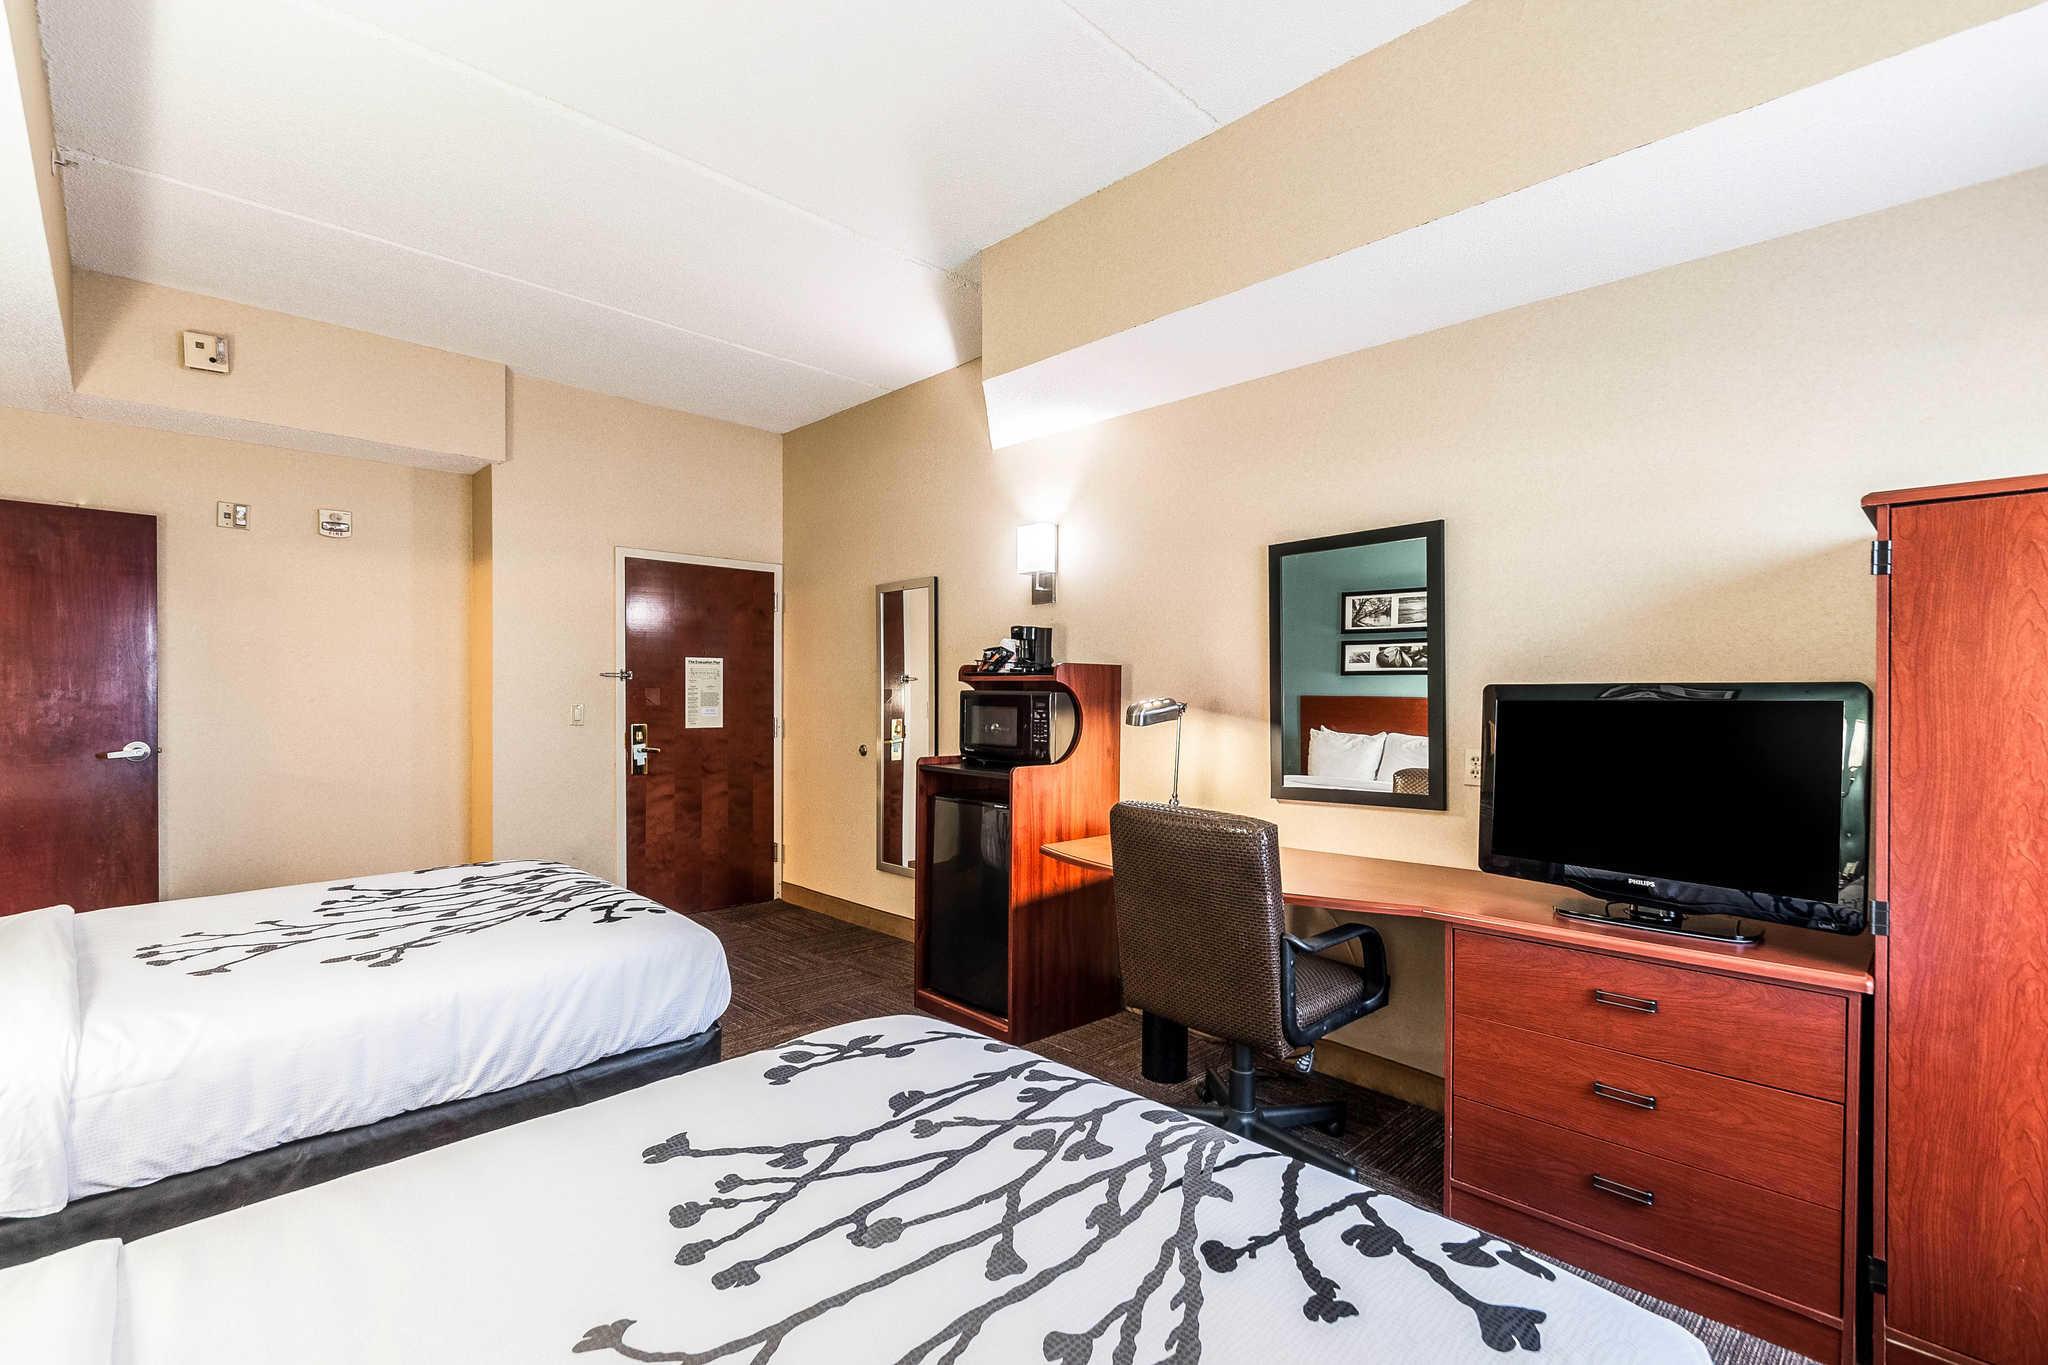 Sleep Inn & Suites Rehoboth Beach image 10